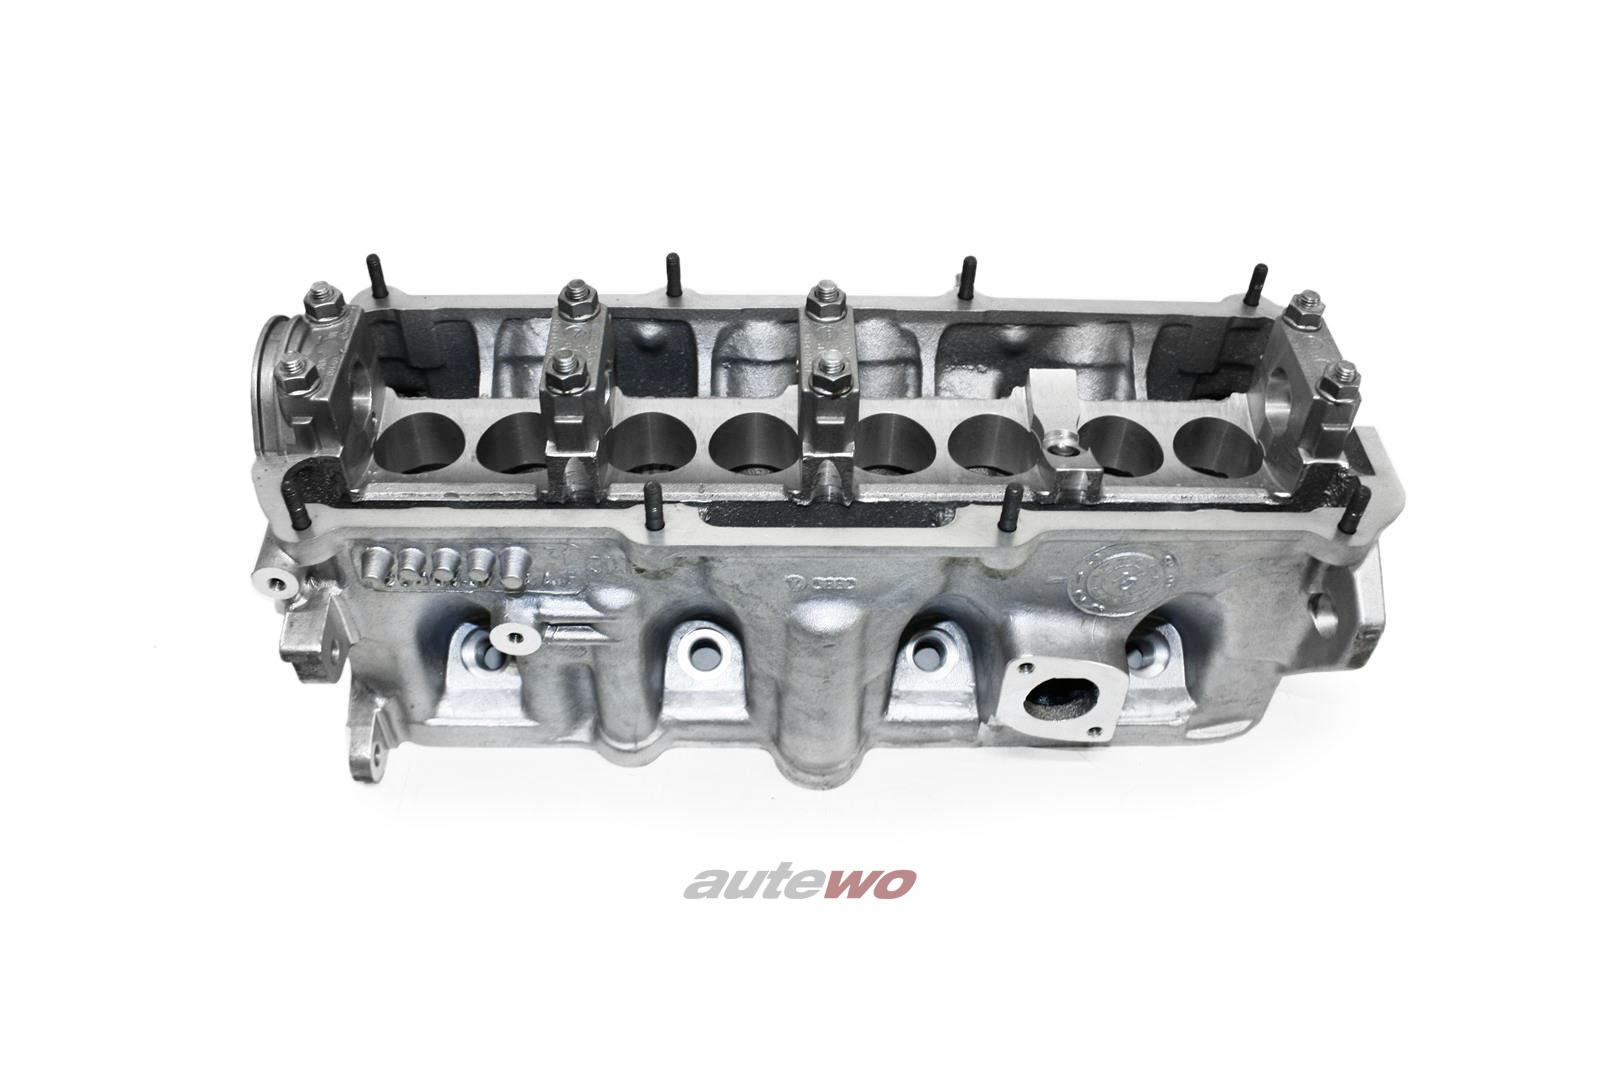 Audi 80/Coupe Typ 81/85 GTE 1.8l DZ/MU/PV Zylinderkopf 026103265KX 026103351P